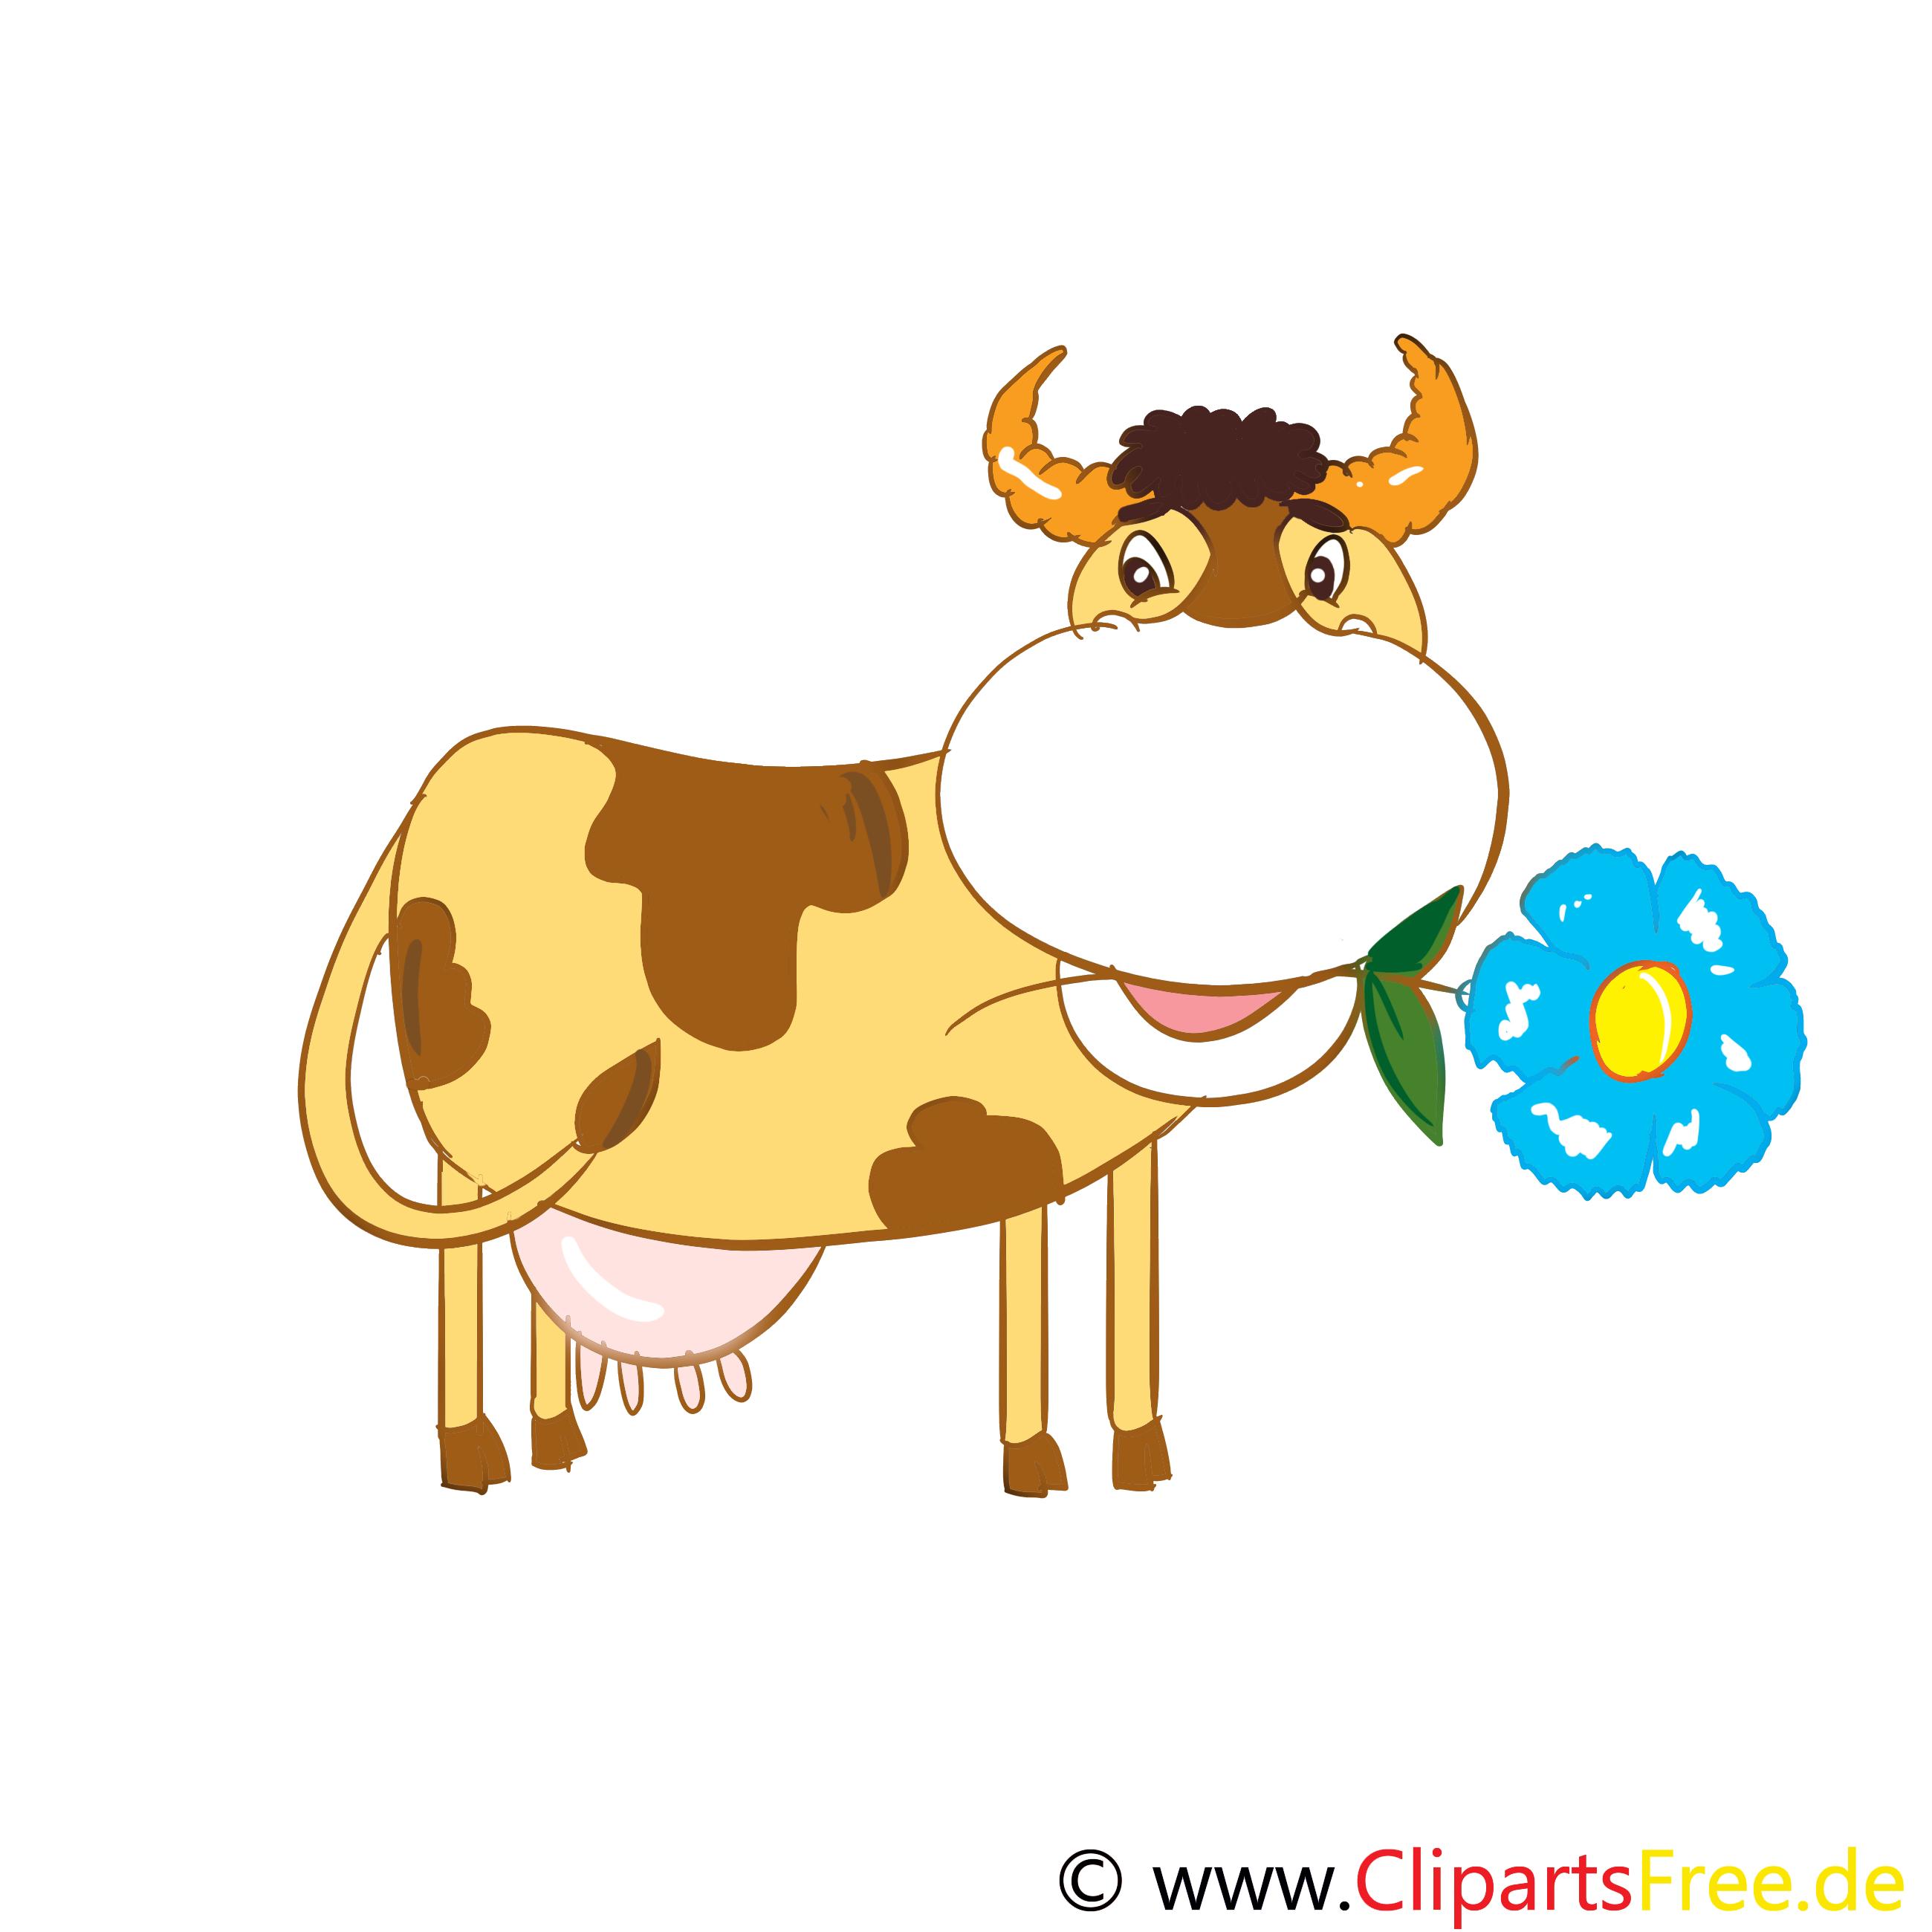 Cliparts Kuh Cartoon kostenlos - Kuh Melken PNG